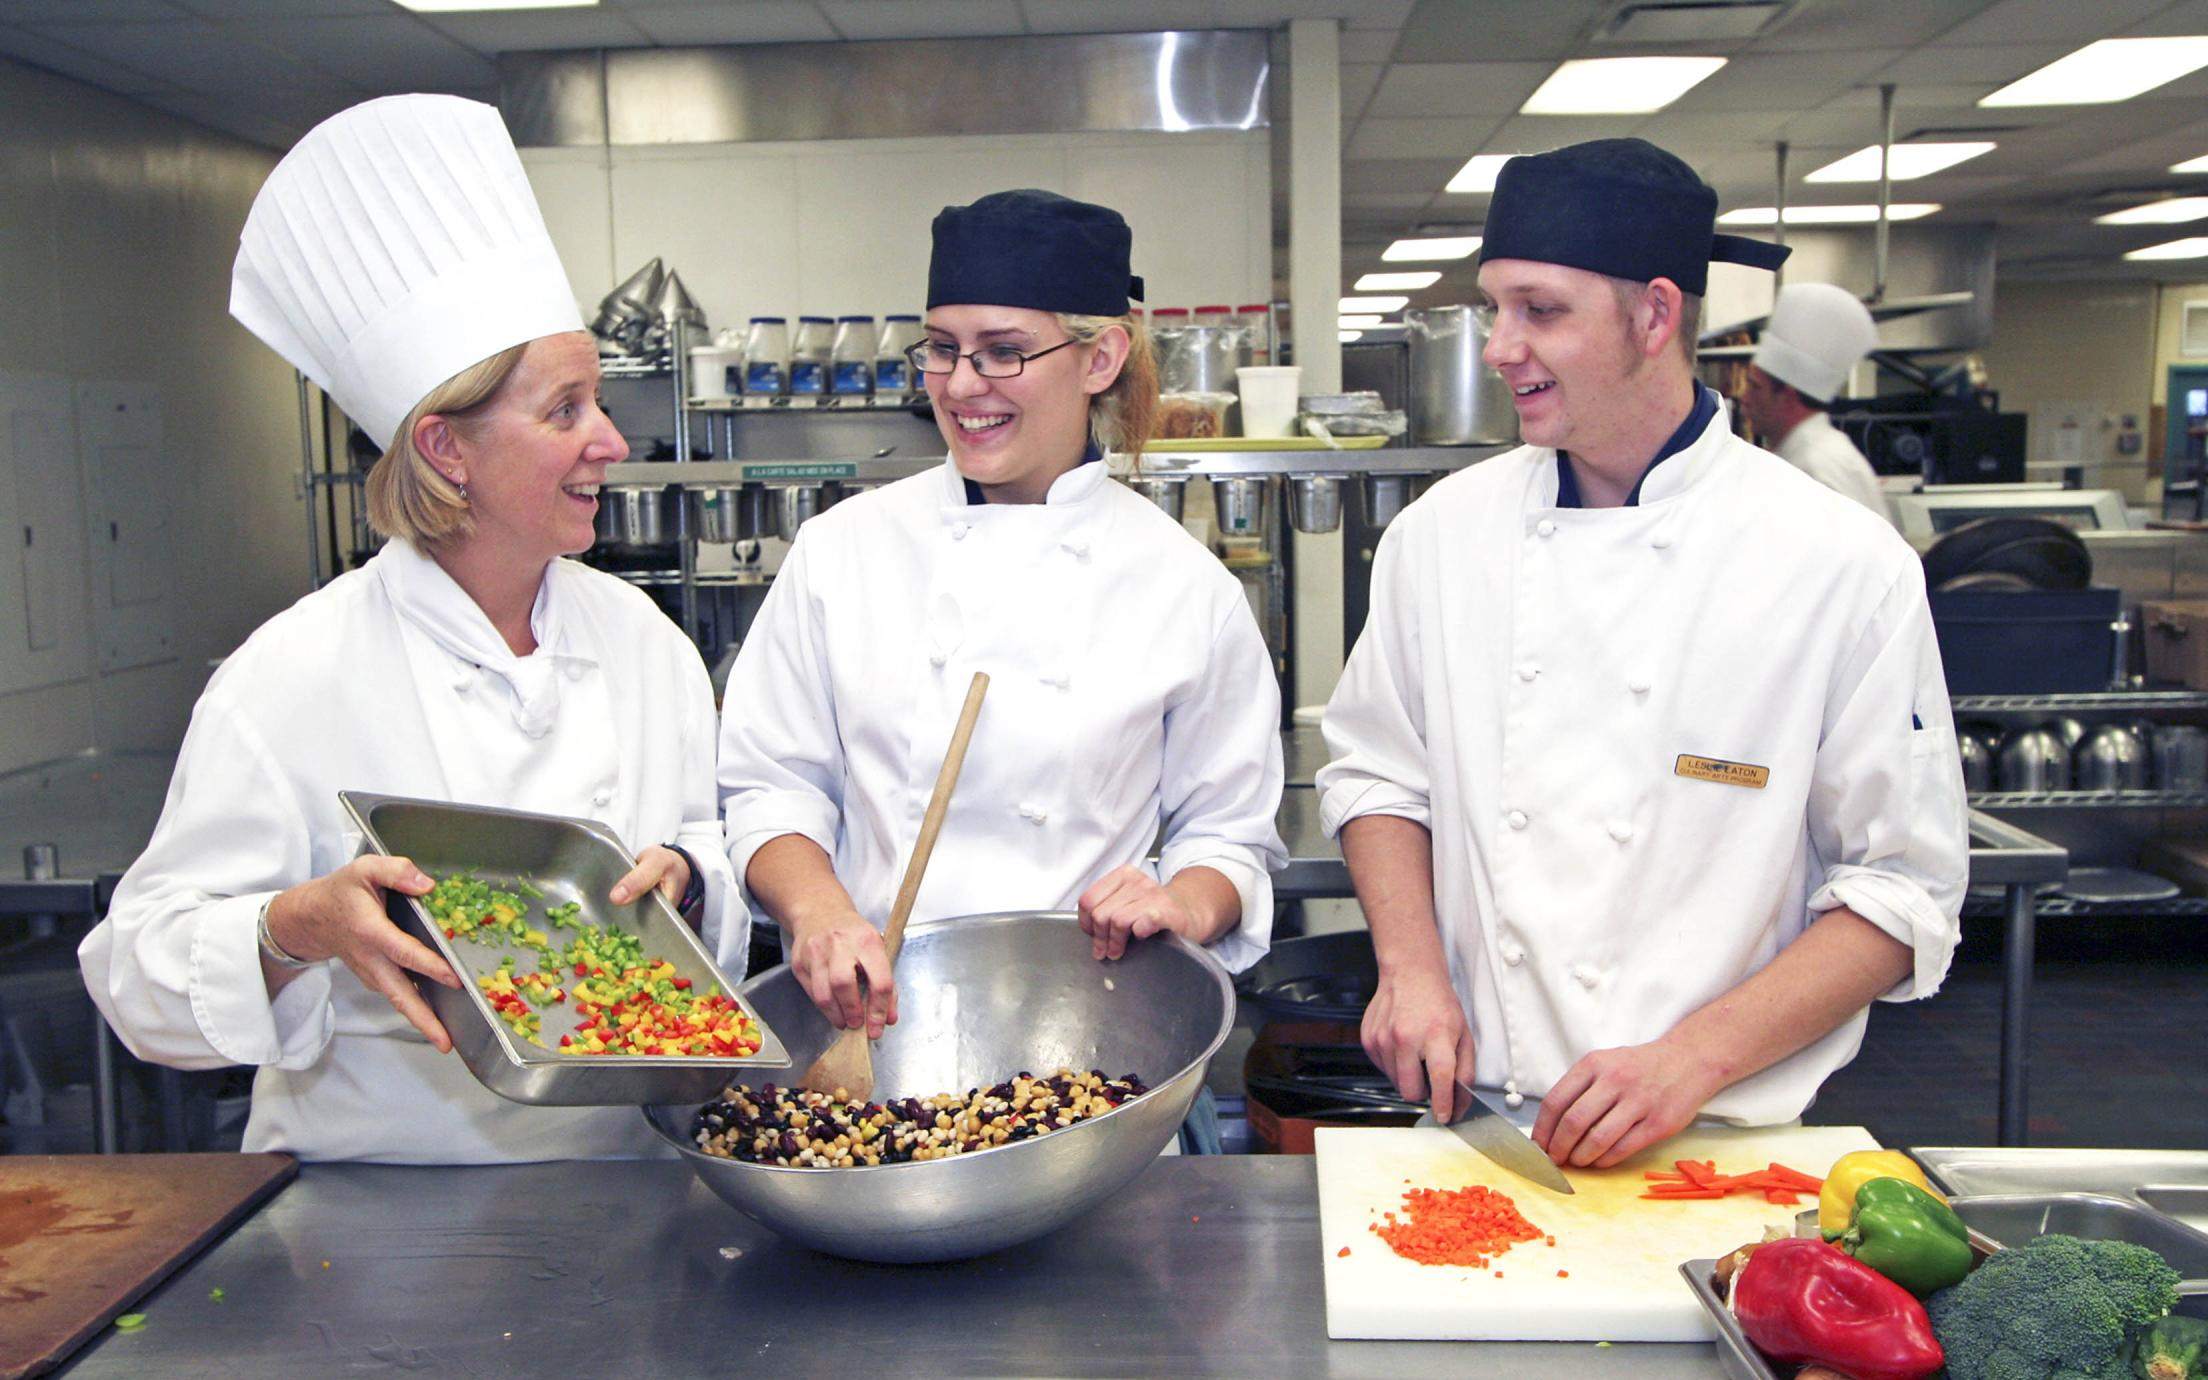 Students of the Culinary Arts program at VIU's Culinary School